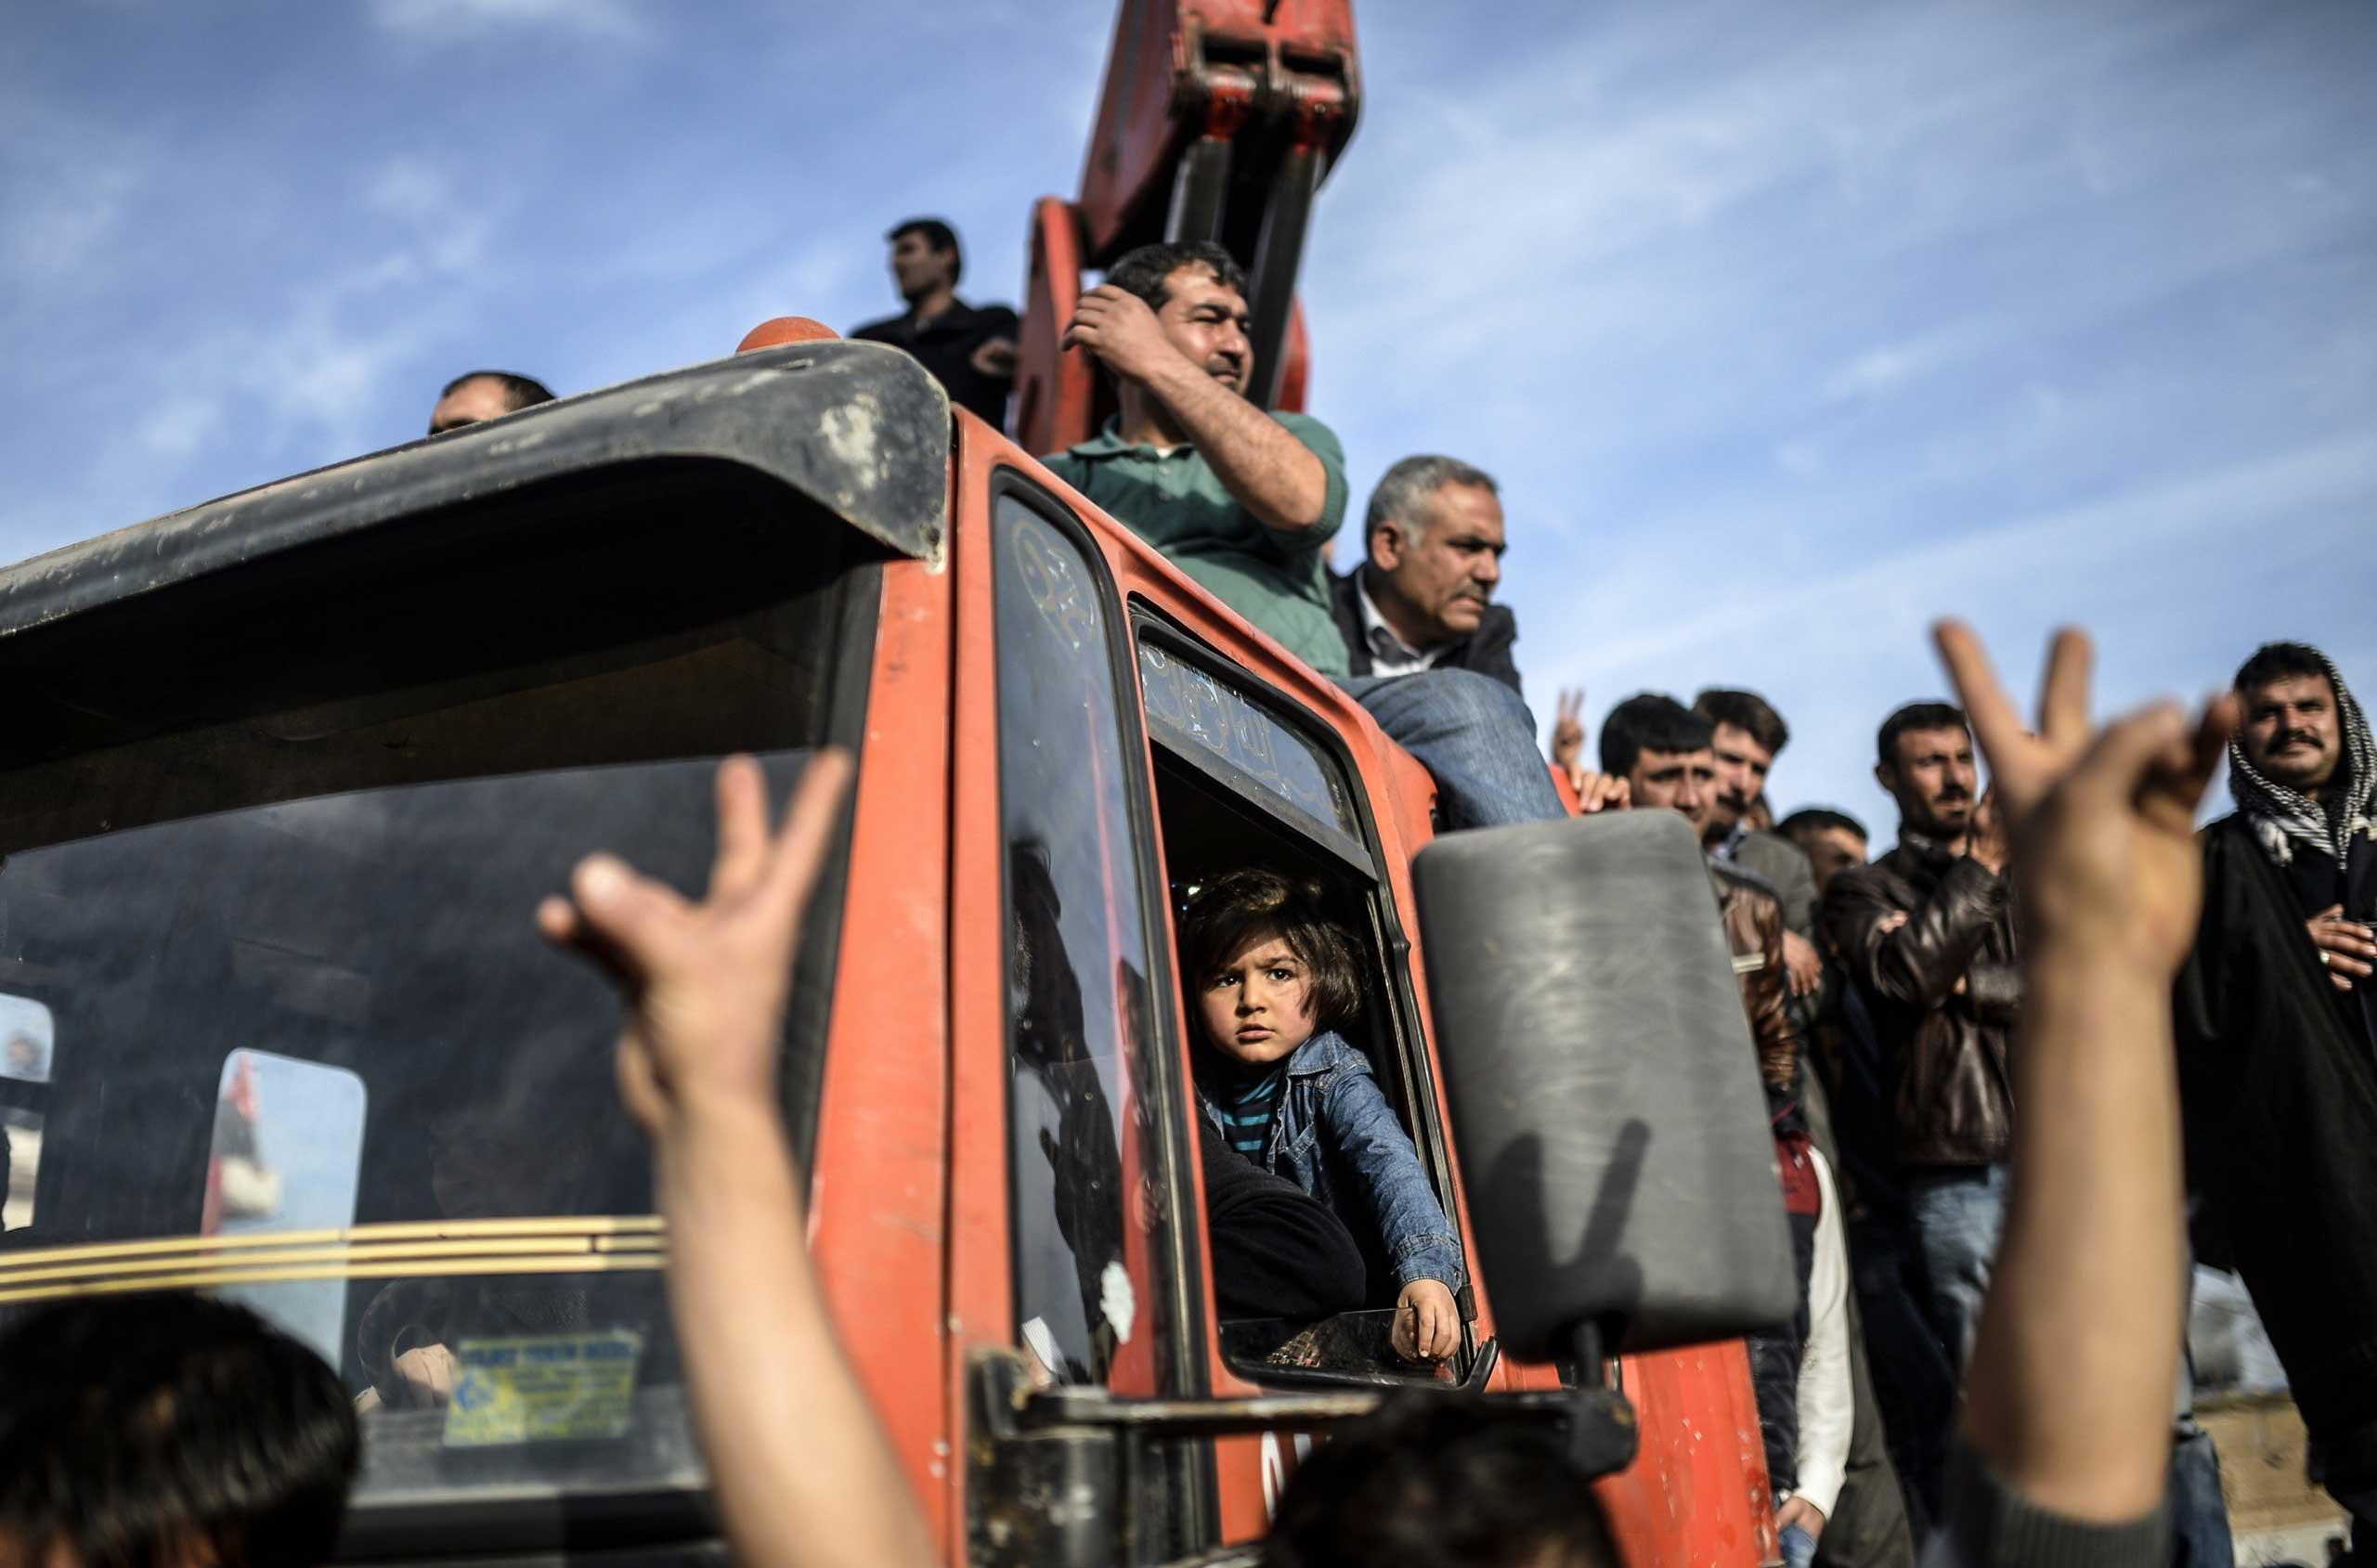 Kurdish attend a celebration rally near the Turkish-Syrian border in Suruc, Turkey, on Jan. 27, 2015.